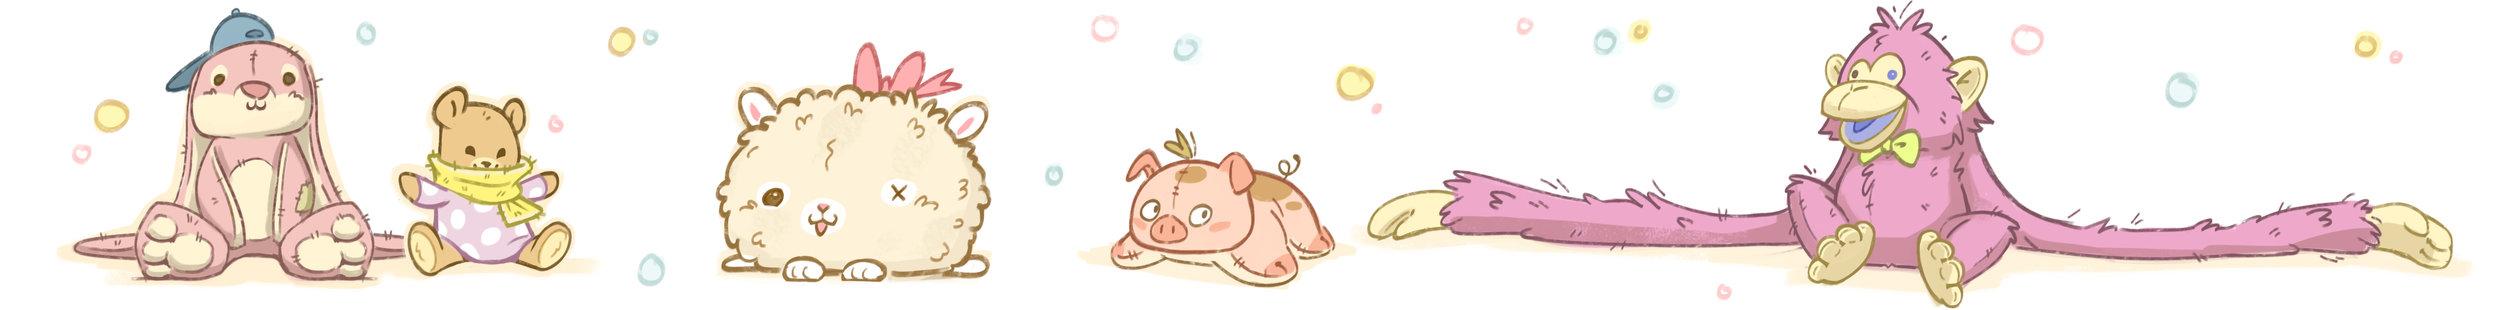 stuffed animals banner.jpg